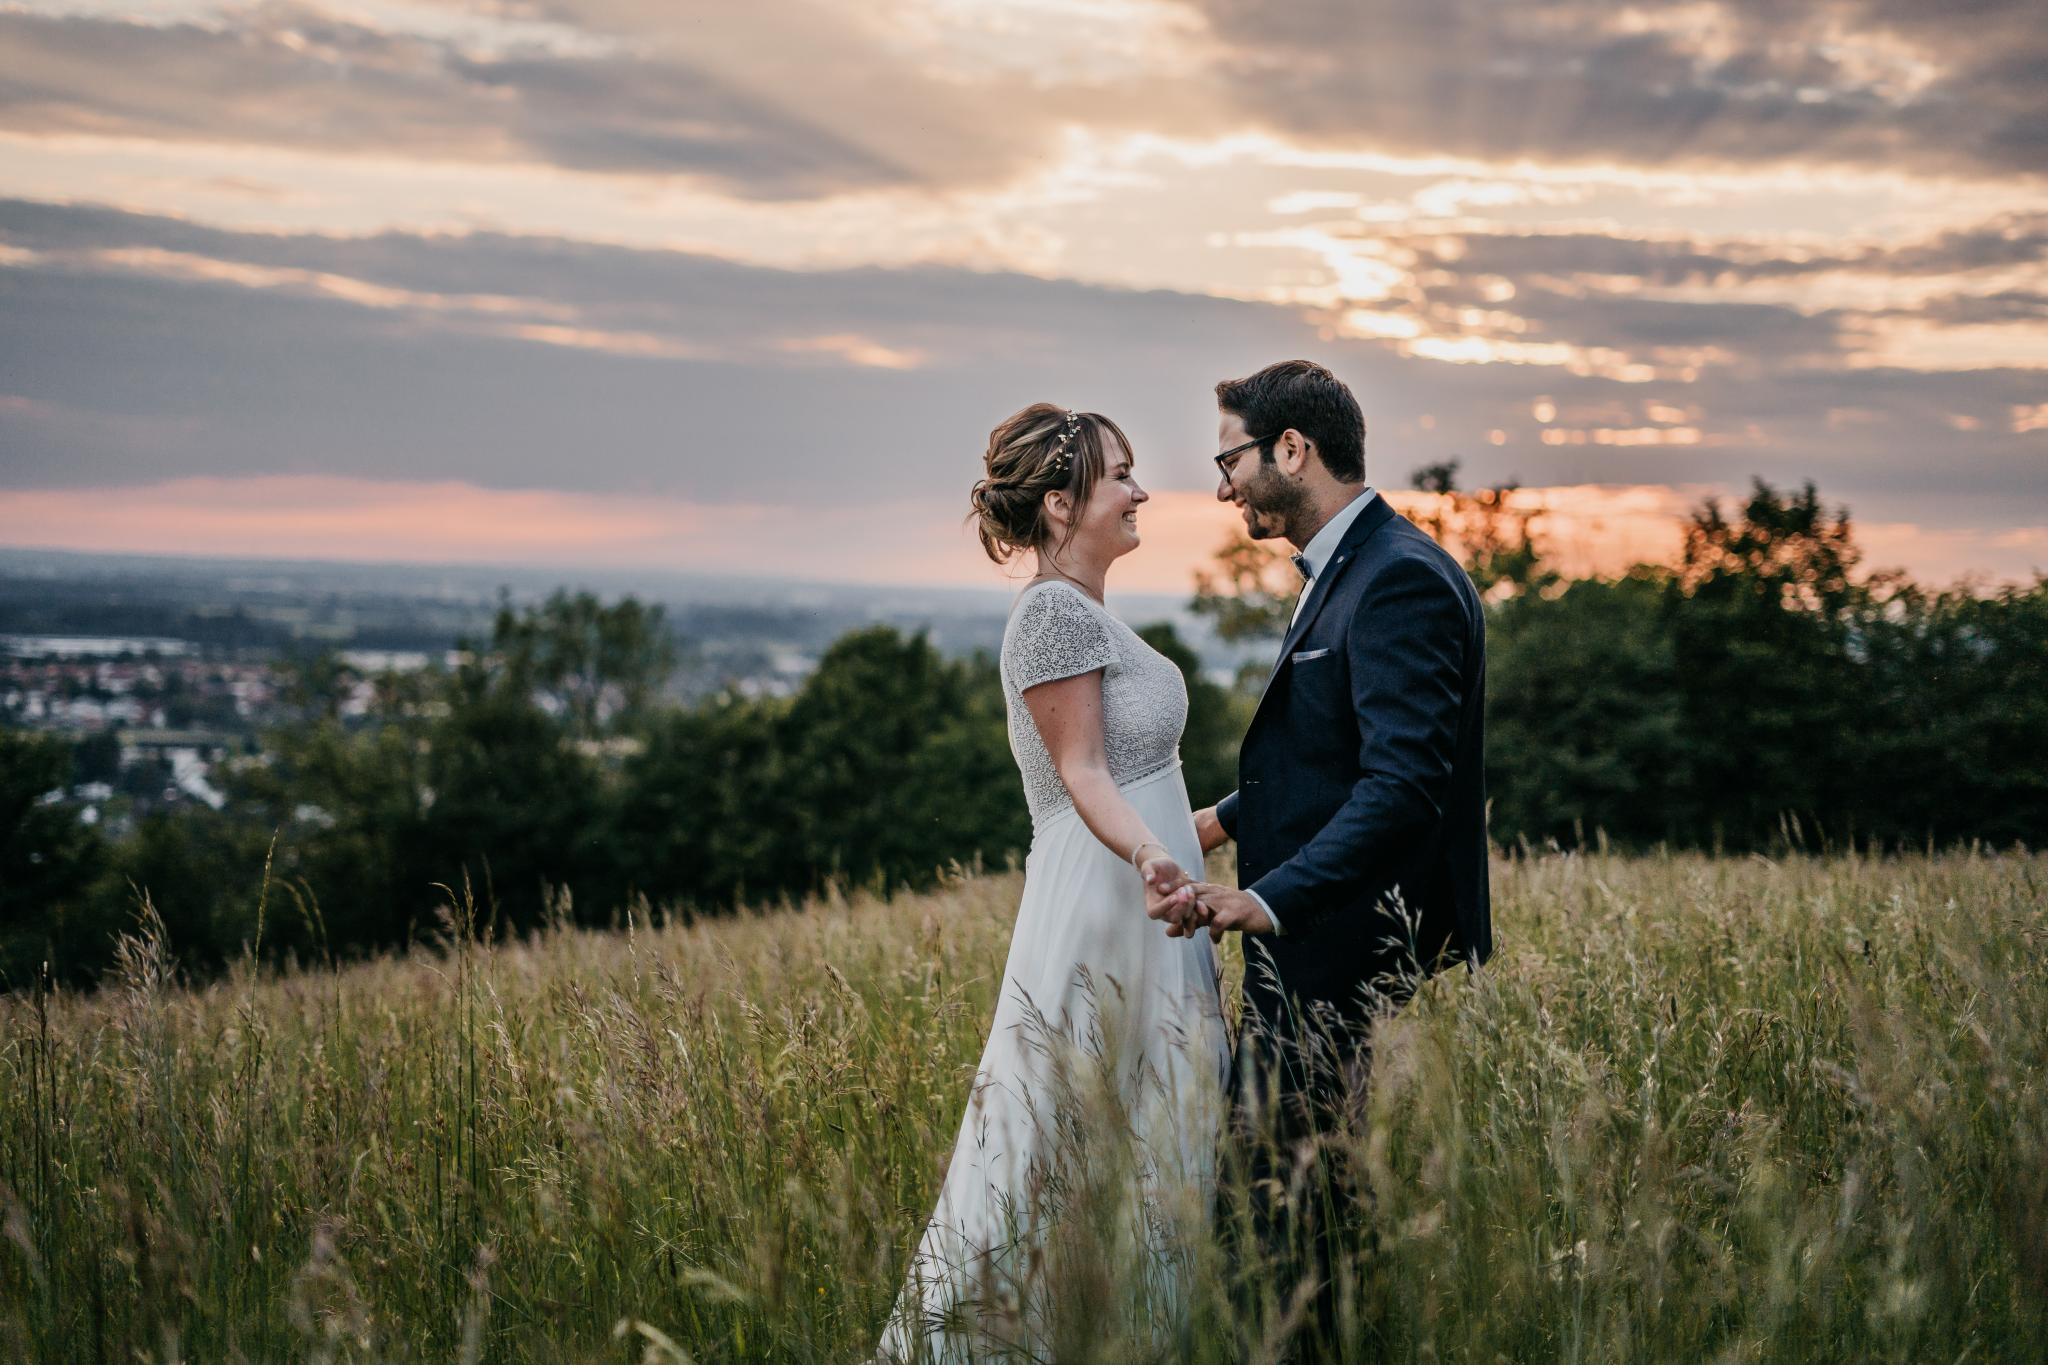 Hochzeit auf Schloss Heiligenberg Sunset Shoot